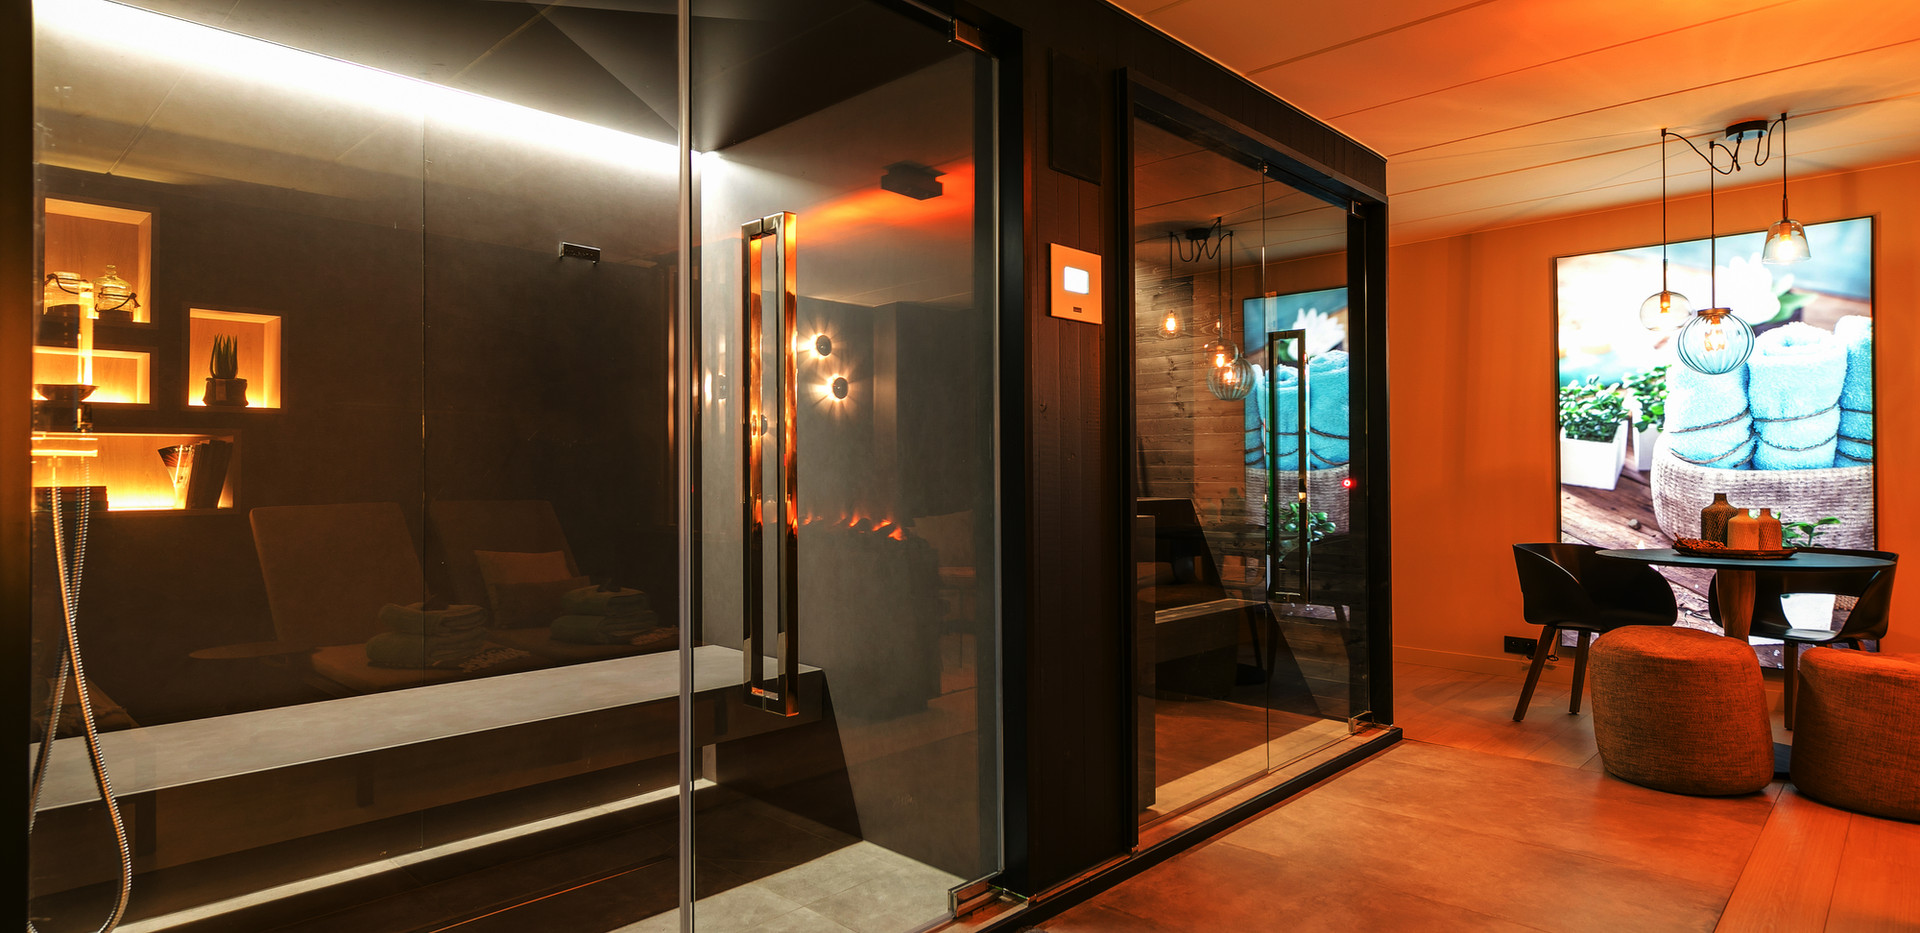 Sauna en Hammam www.wellclusive.be  Sauna te Rijkevorsel